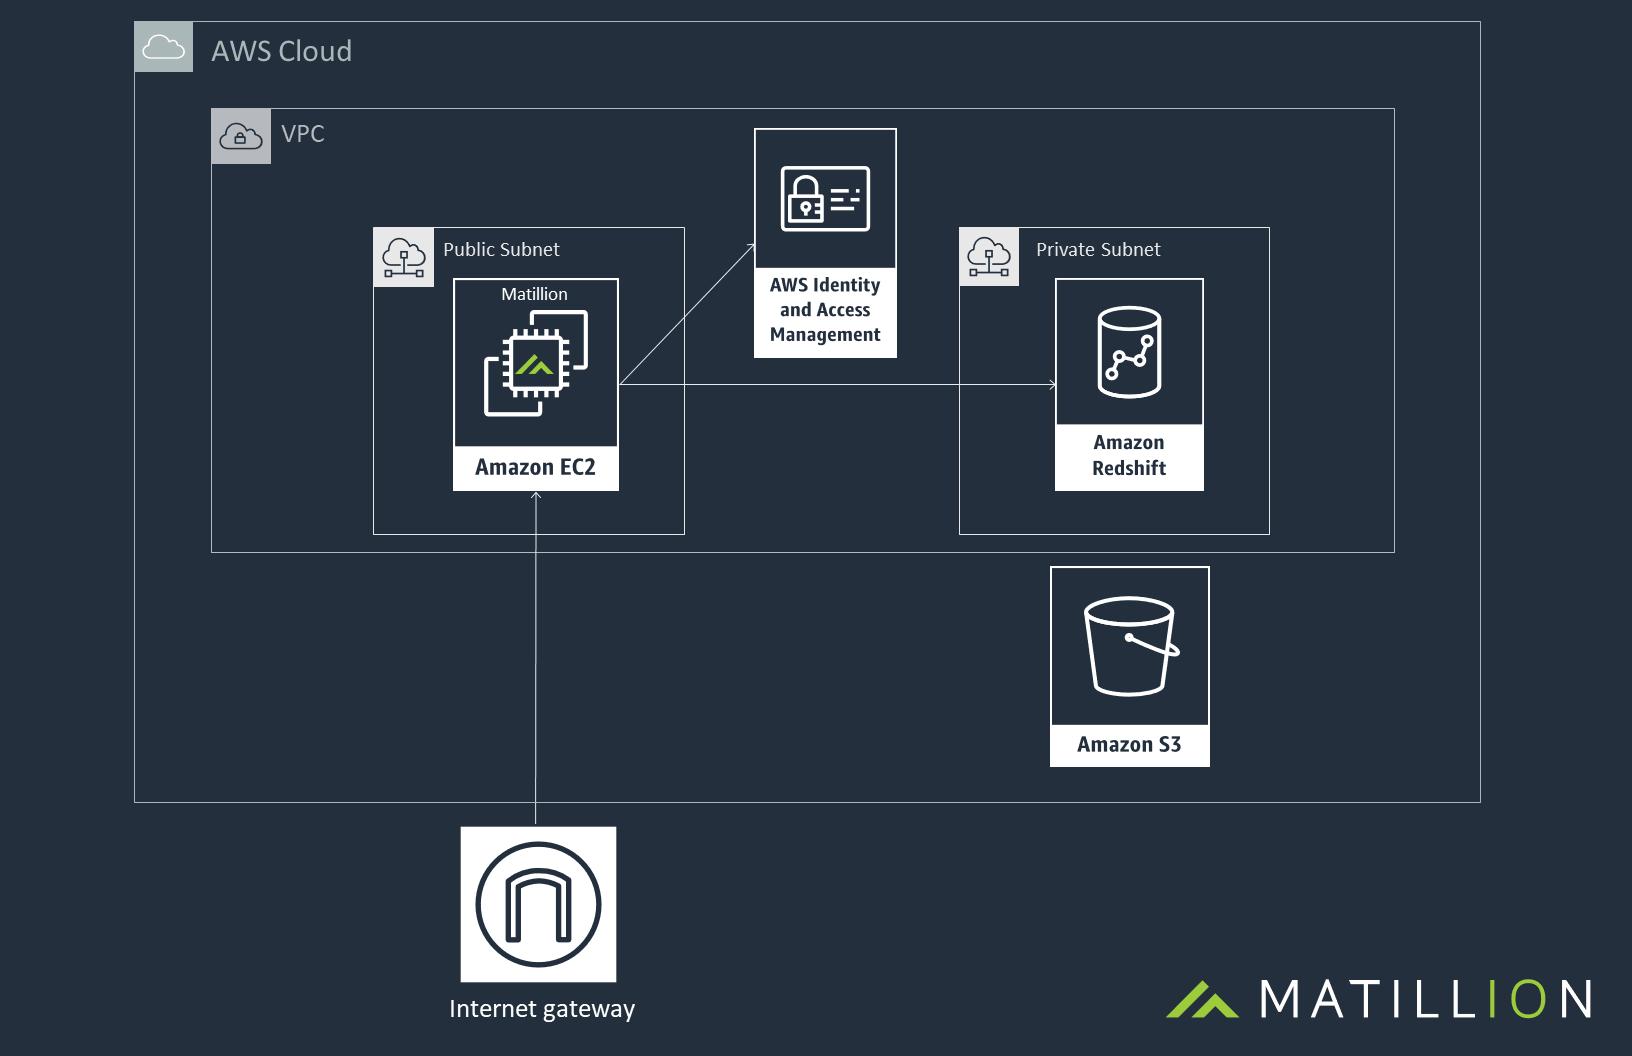 Matillion AWS Architecture Diagram - General Amazon Redshift